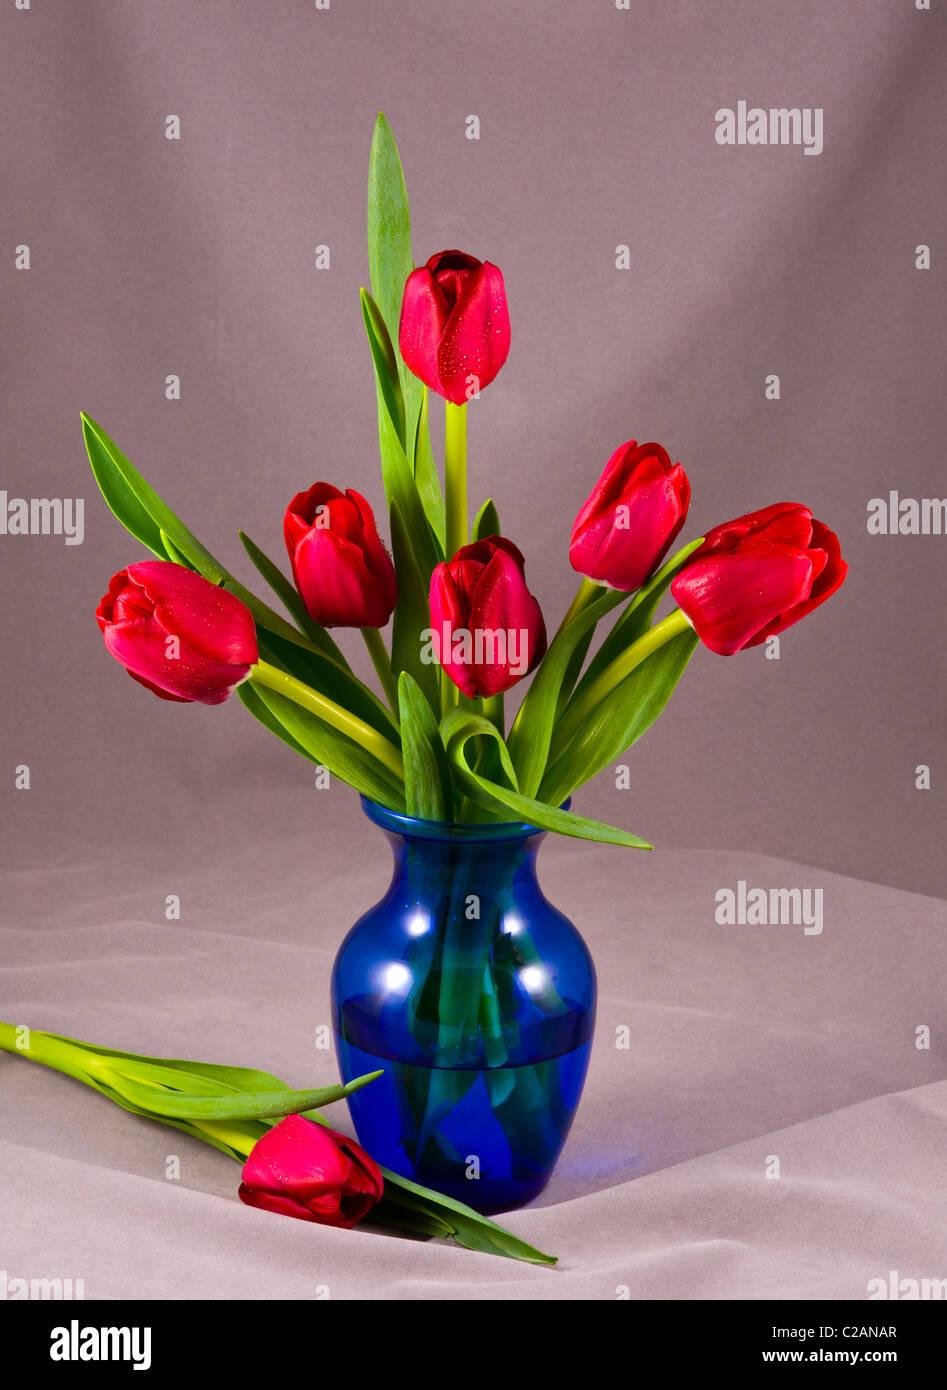 Tulipanes rojos en florero azul niebla de gotas de rocío de agua arreglo de composición de flores bodegón Imagen De Stock